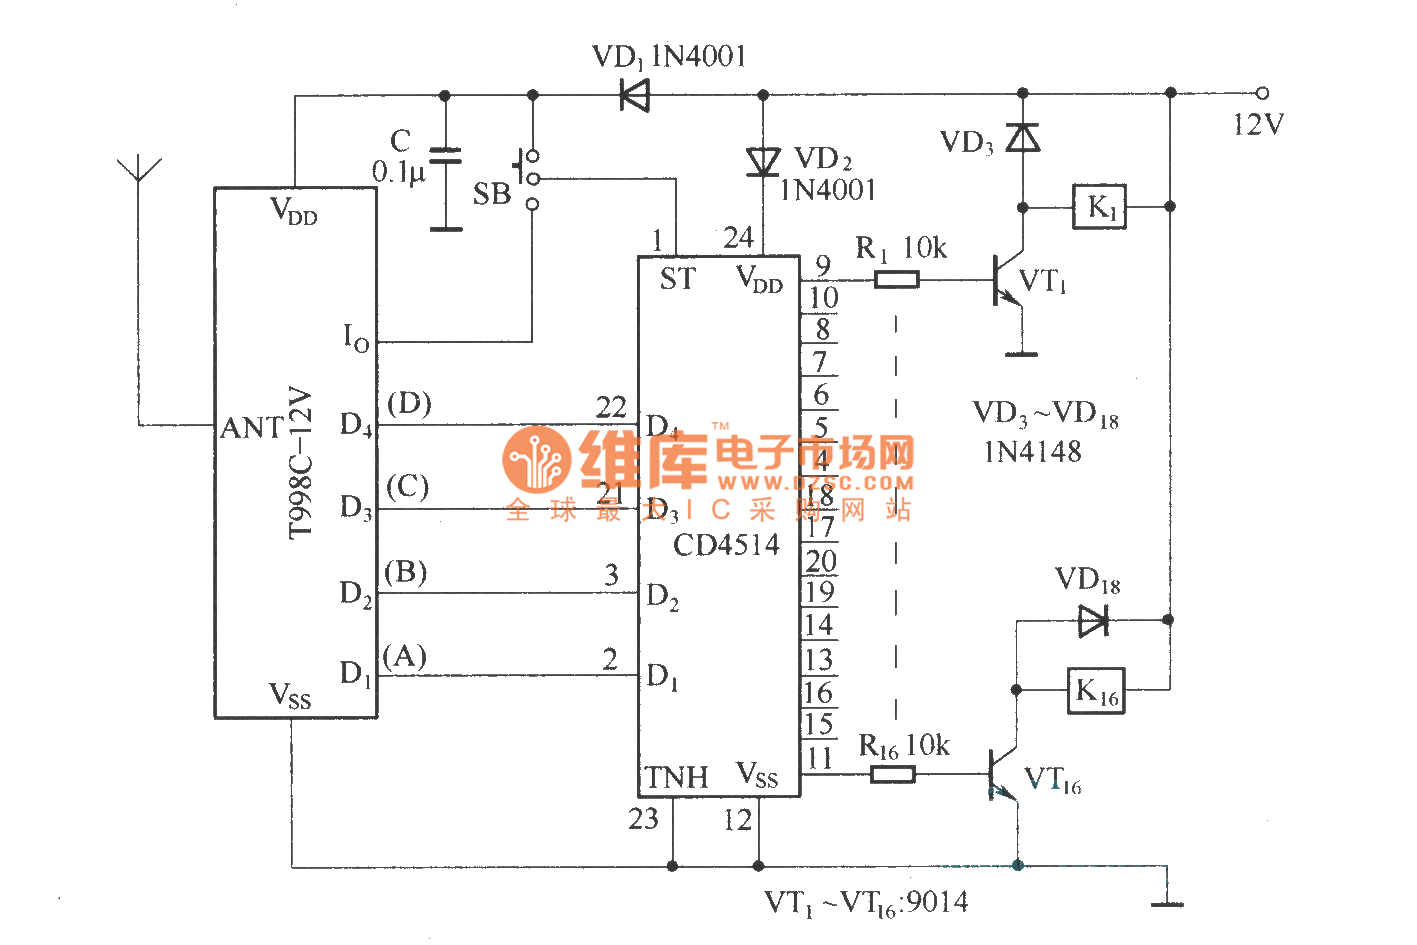 16 Channel Remote Control Circuit T998c Wwwseekiccom Circuitdiagram Basiccircuit Ratiometricadconverter